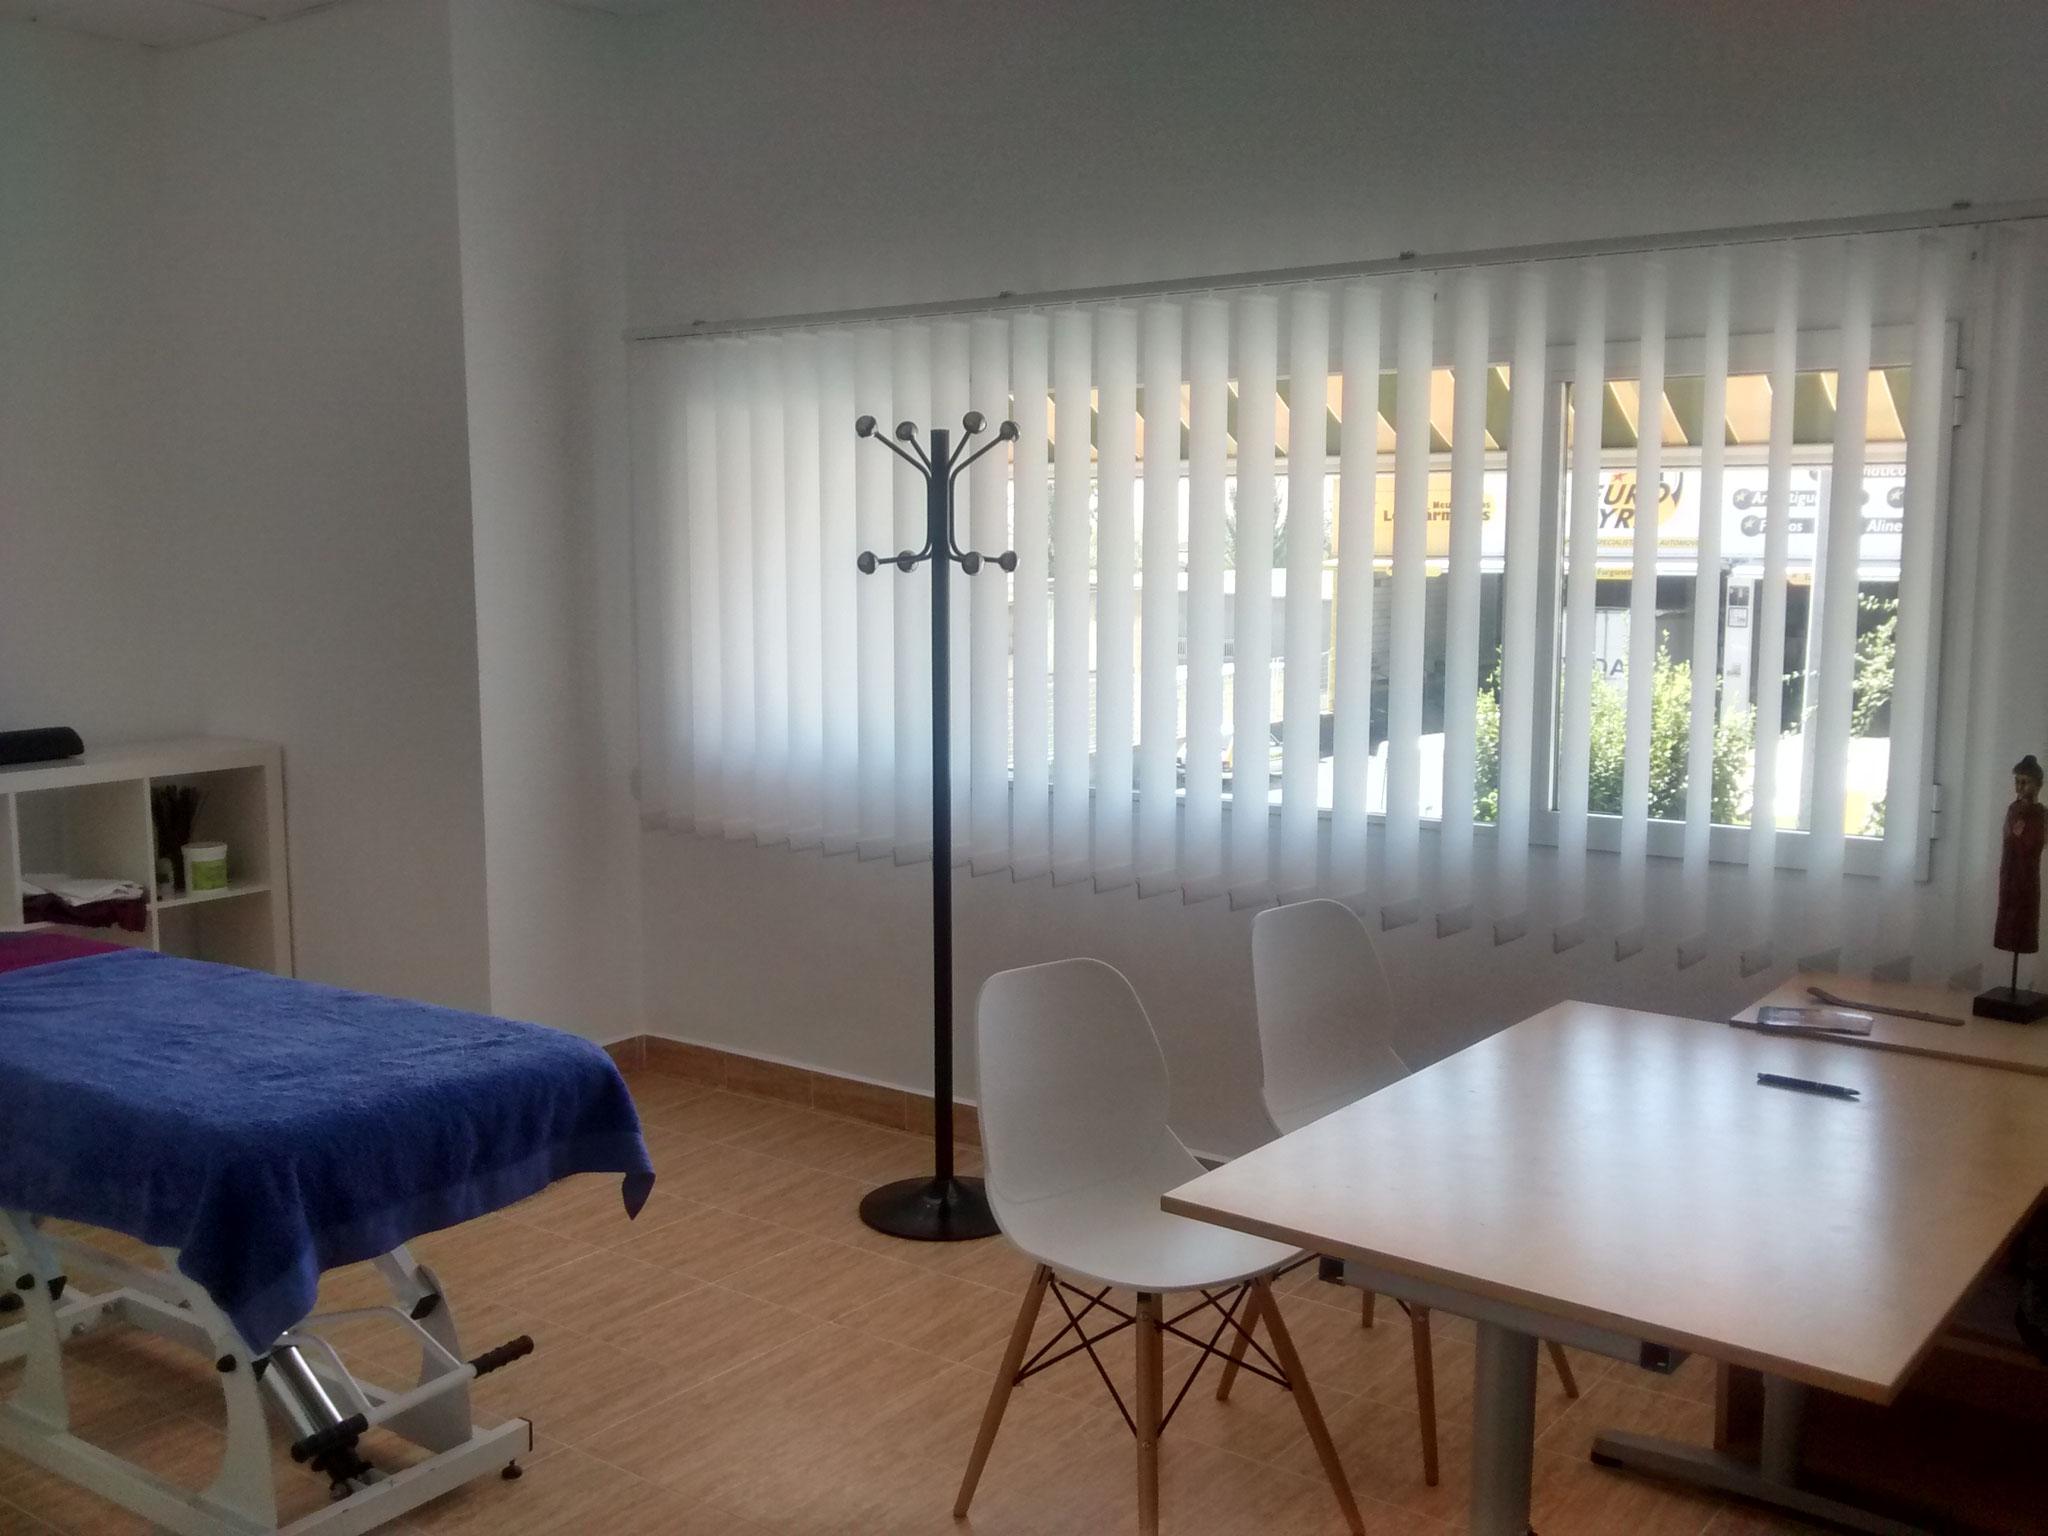 C/ Baza, Parcela 3, Oficina D -  Parque Empresarial Juncaril.  18.220 - Albolote, Granada